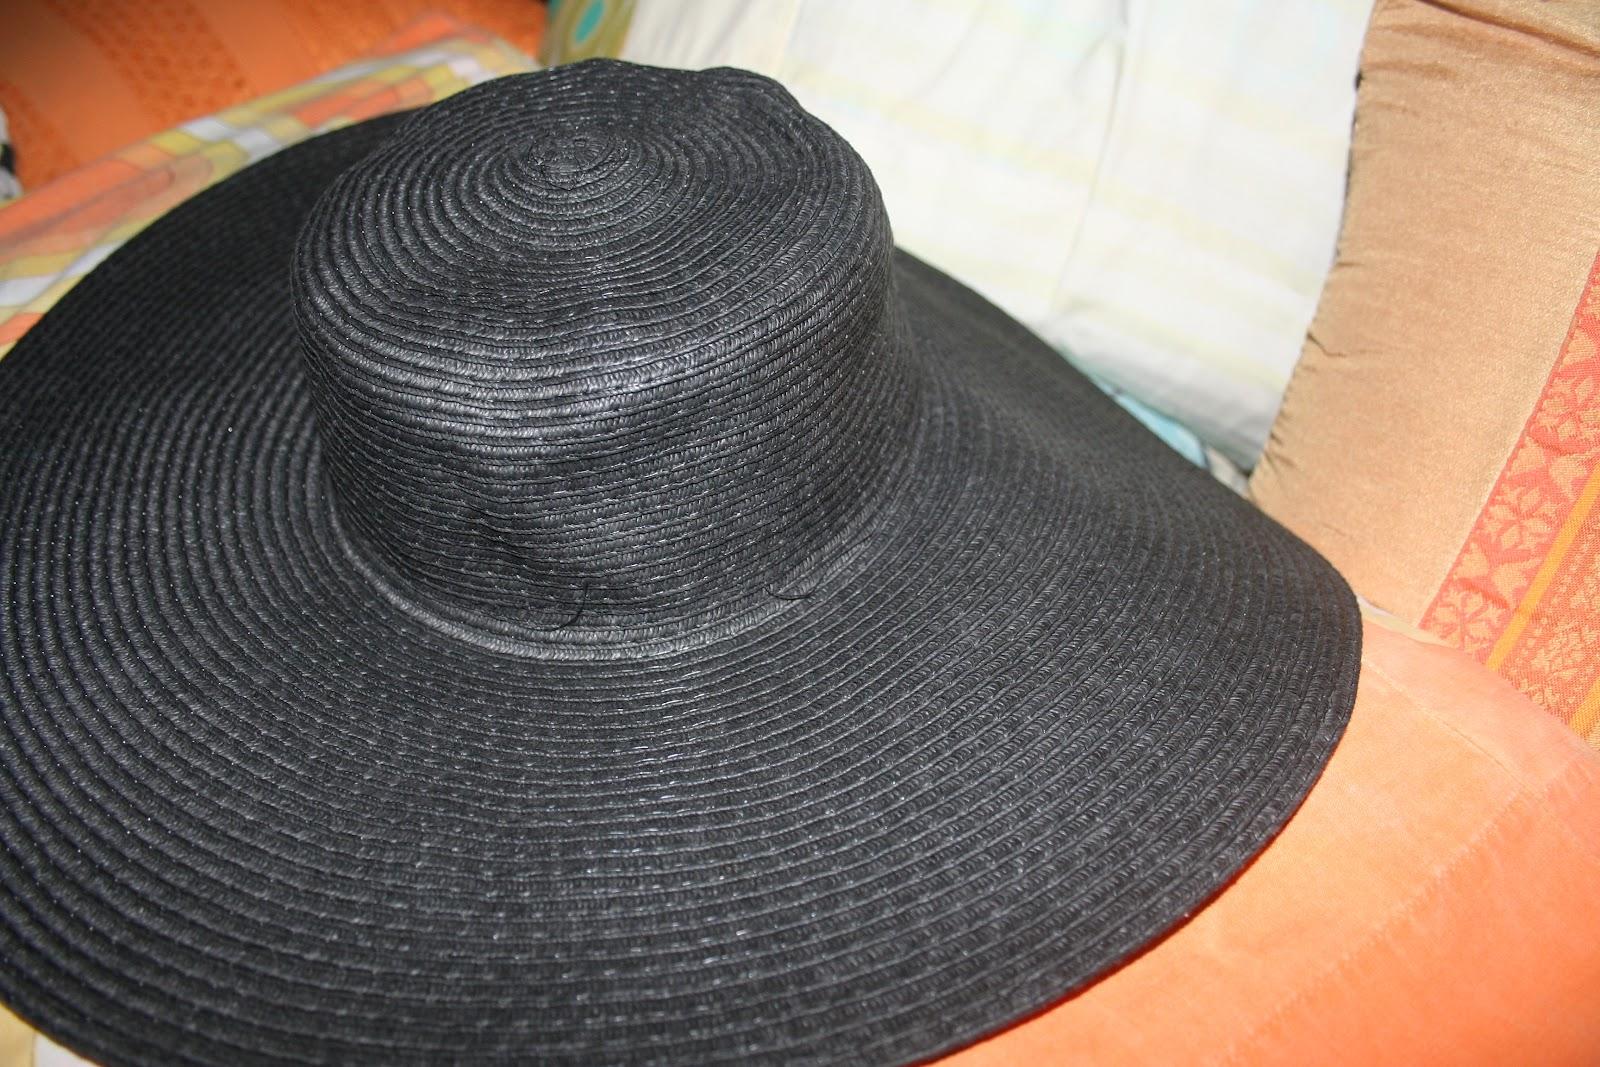 Black Floppy Hat - PHP 100-PHP 150 (Boracay) 3bcd3a5e94